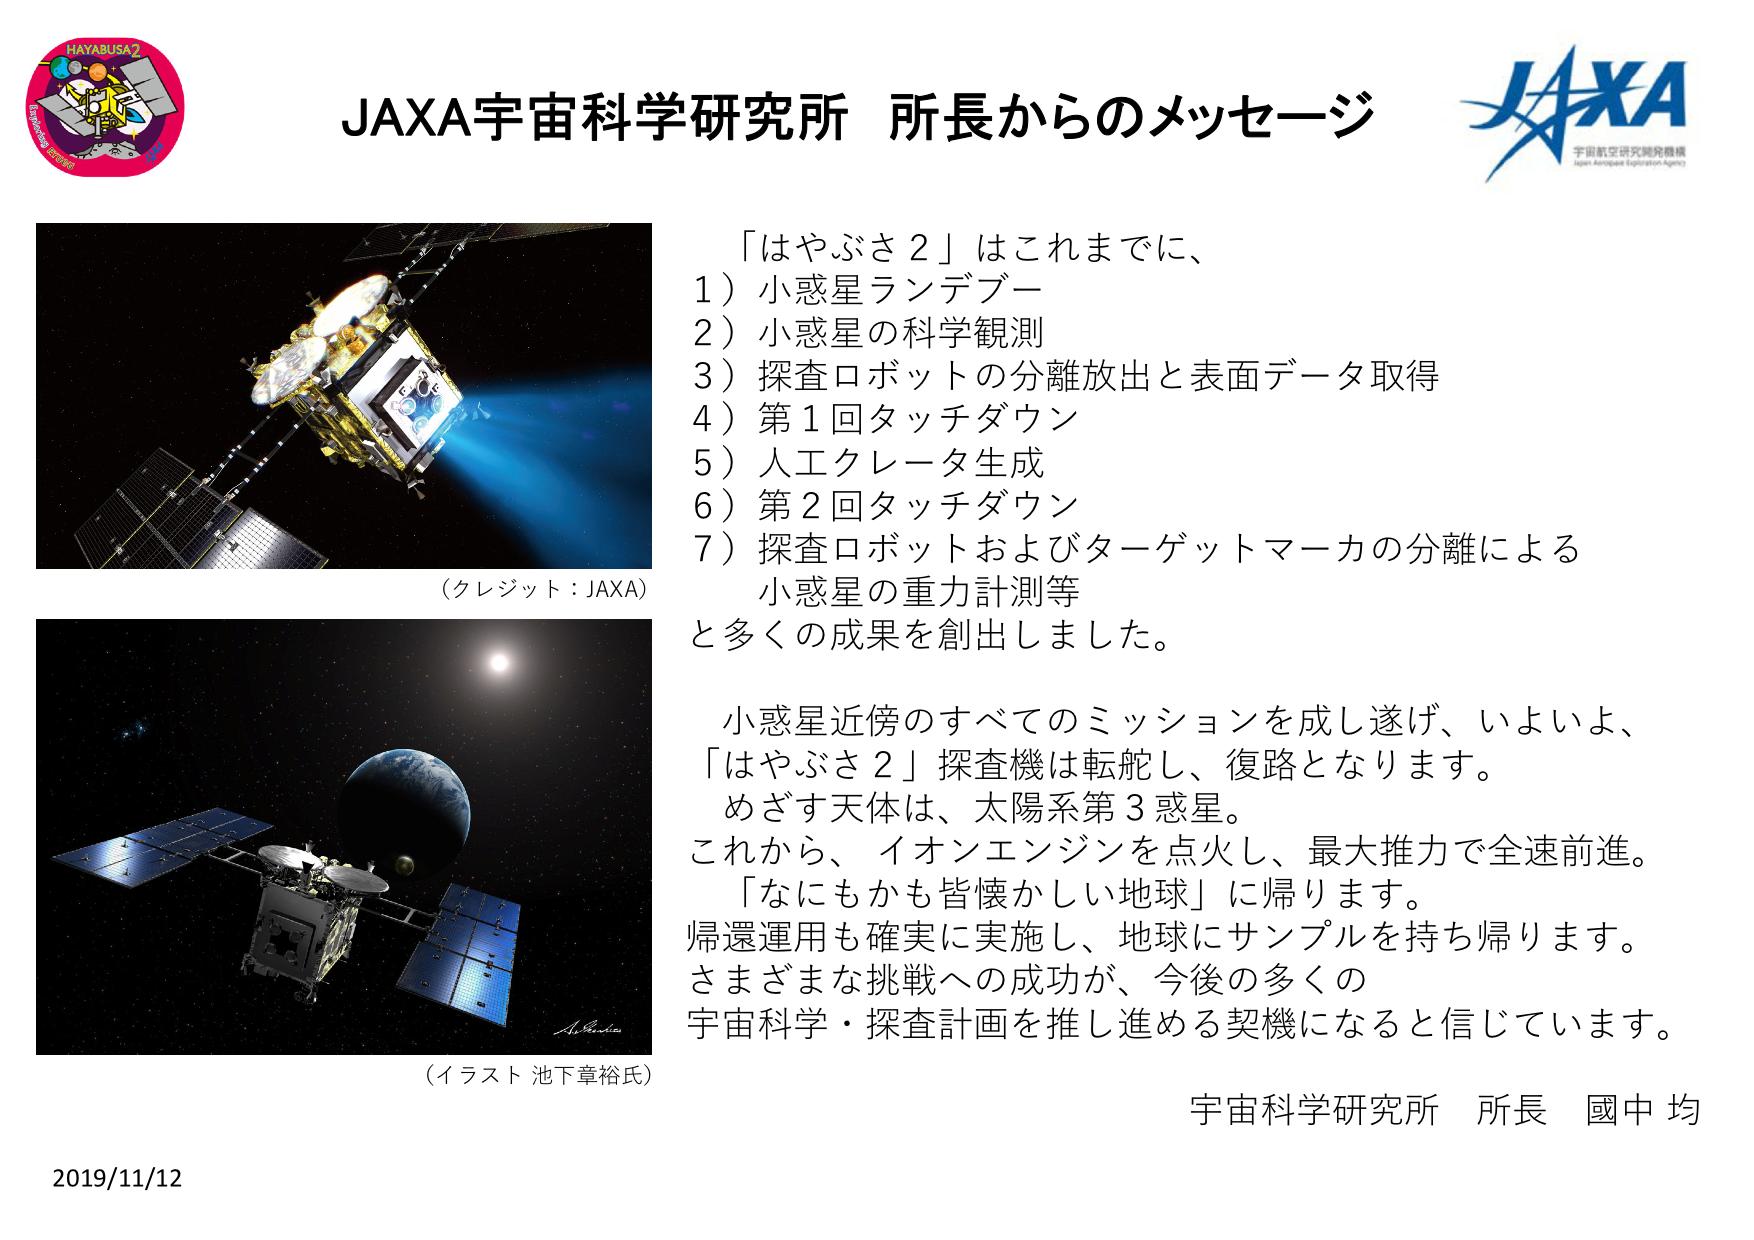 f:id:Imamura:20191112202756p:plain